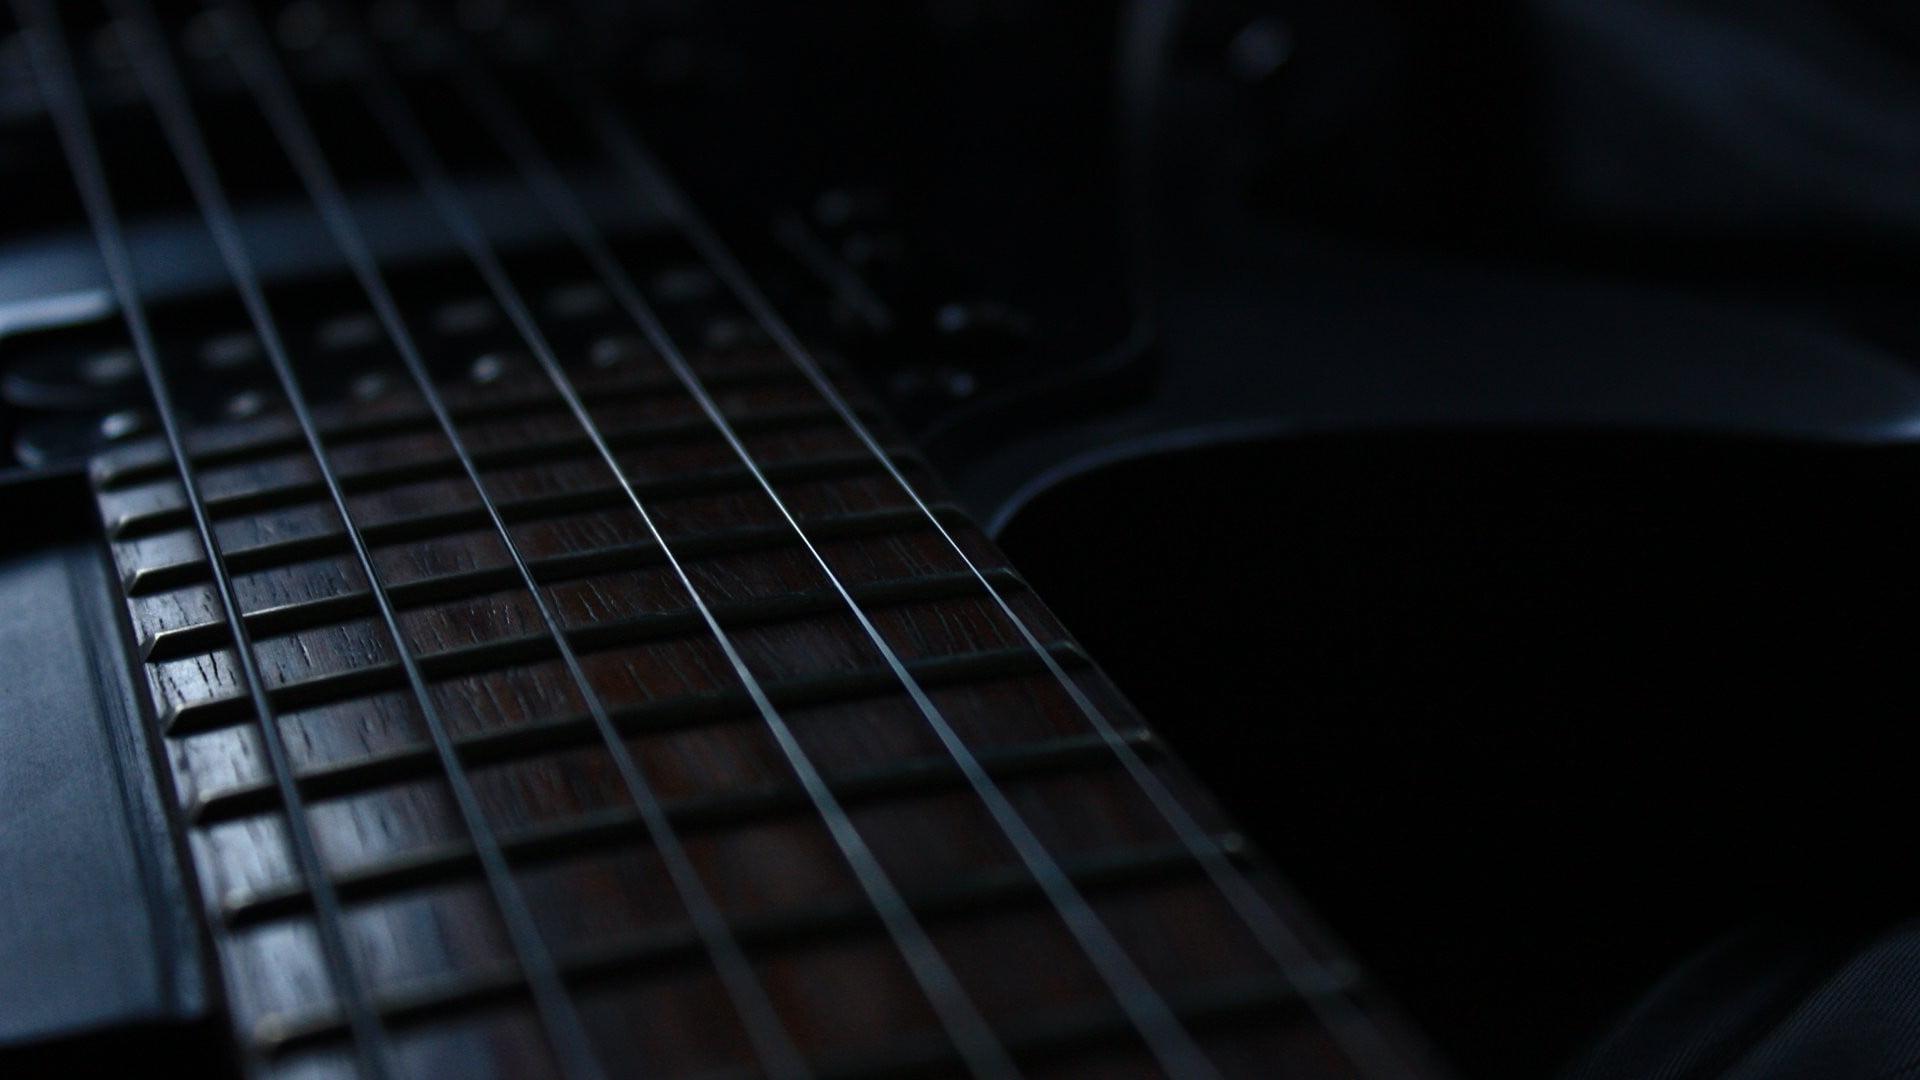 Guitare pour Gaucher